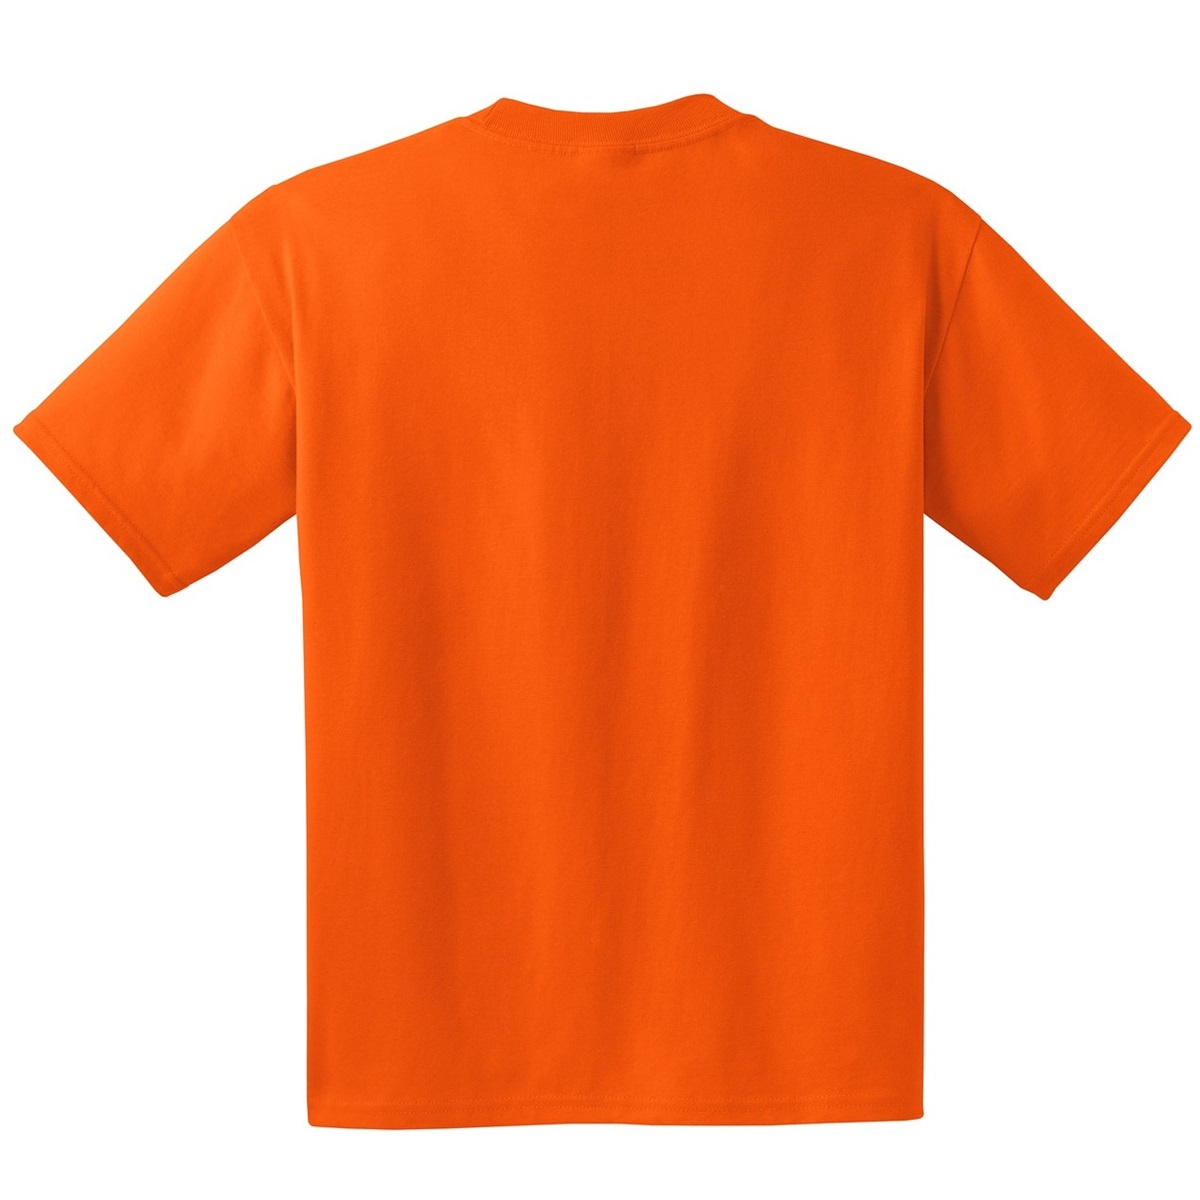 Hanes 5190 Beefy T Cotton T Shirt With Pocket Orange